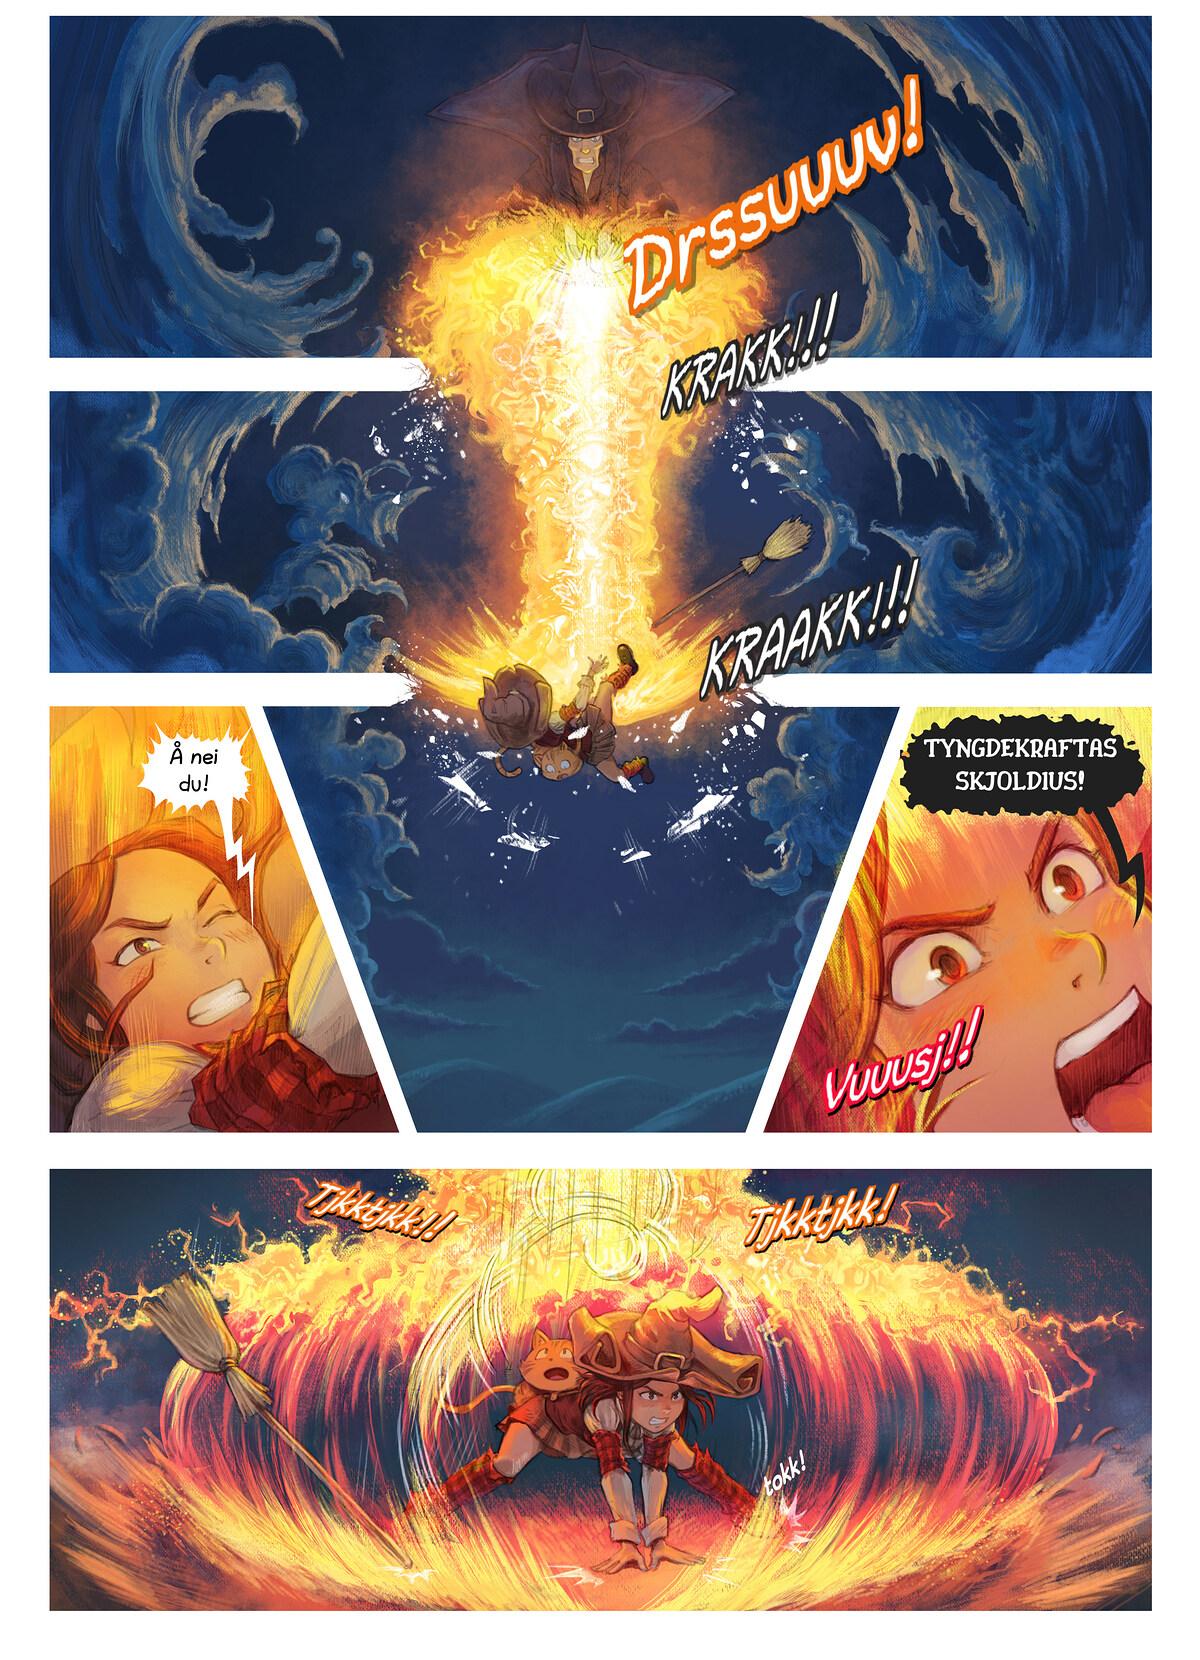 Episode 31: Den store kampen, Page 2